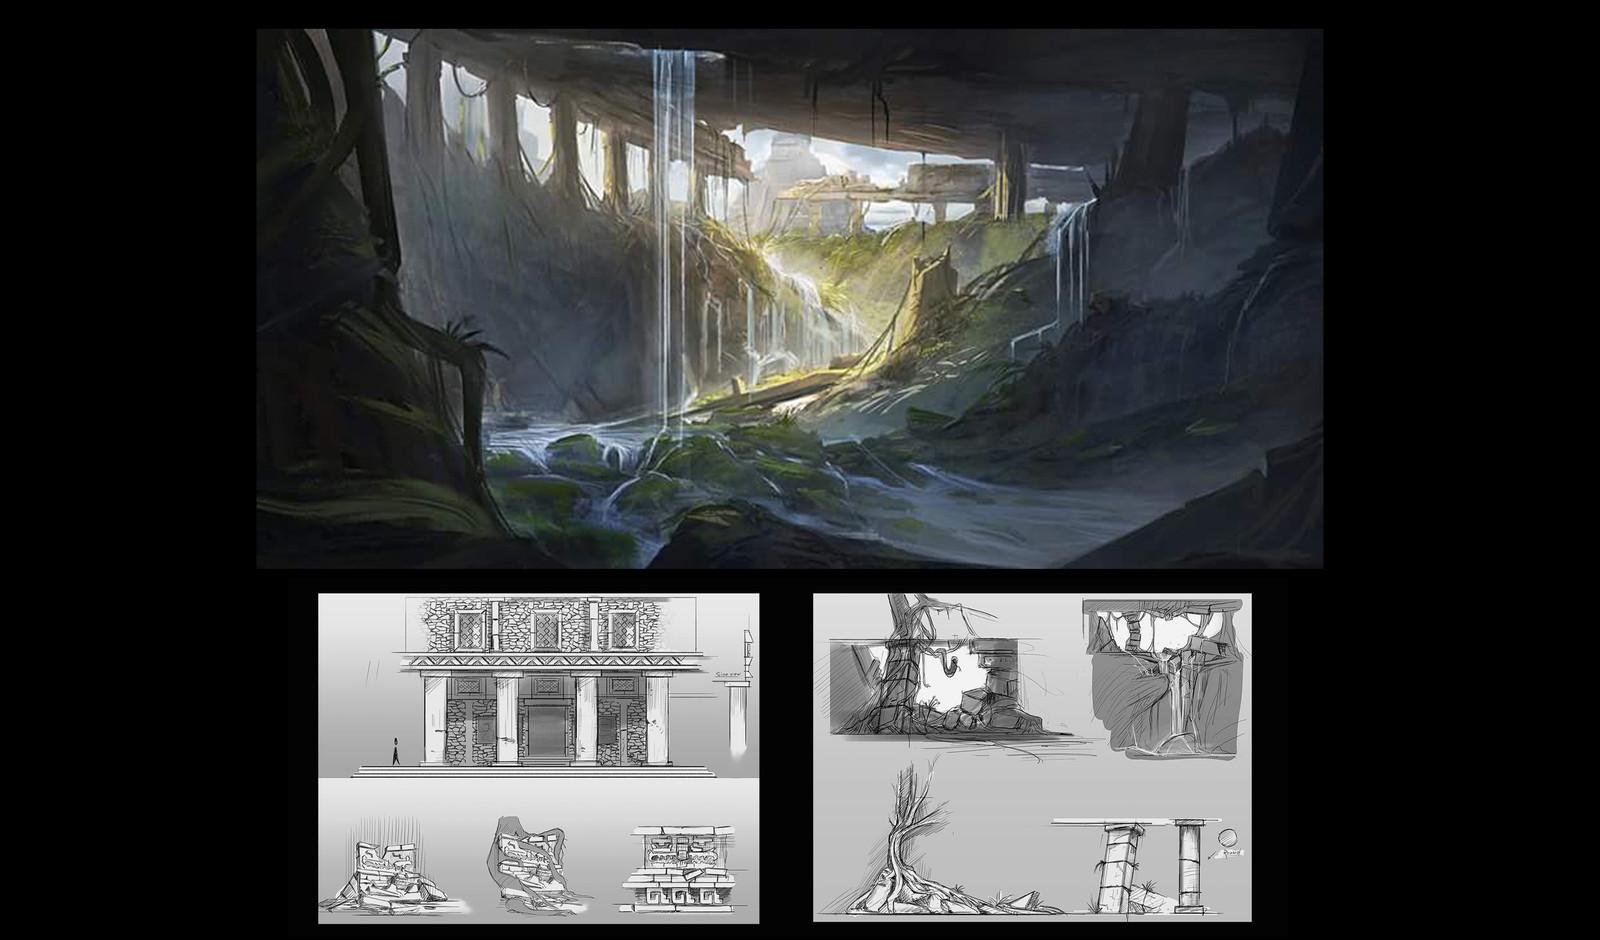 Ruins sketches